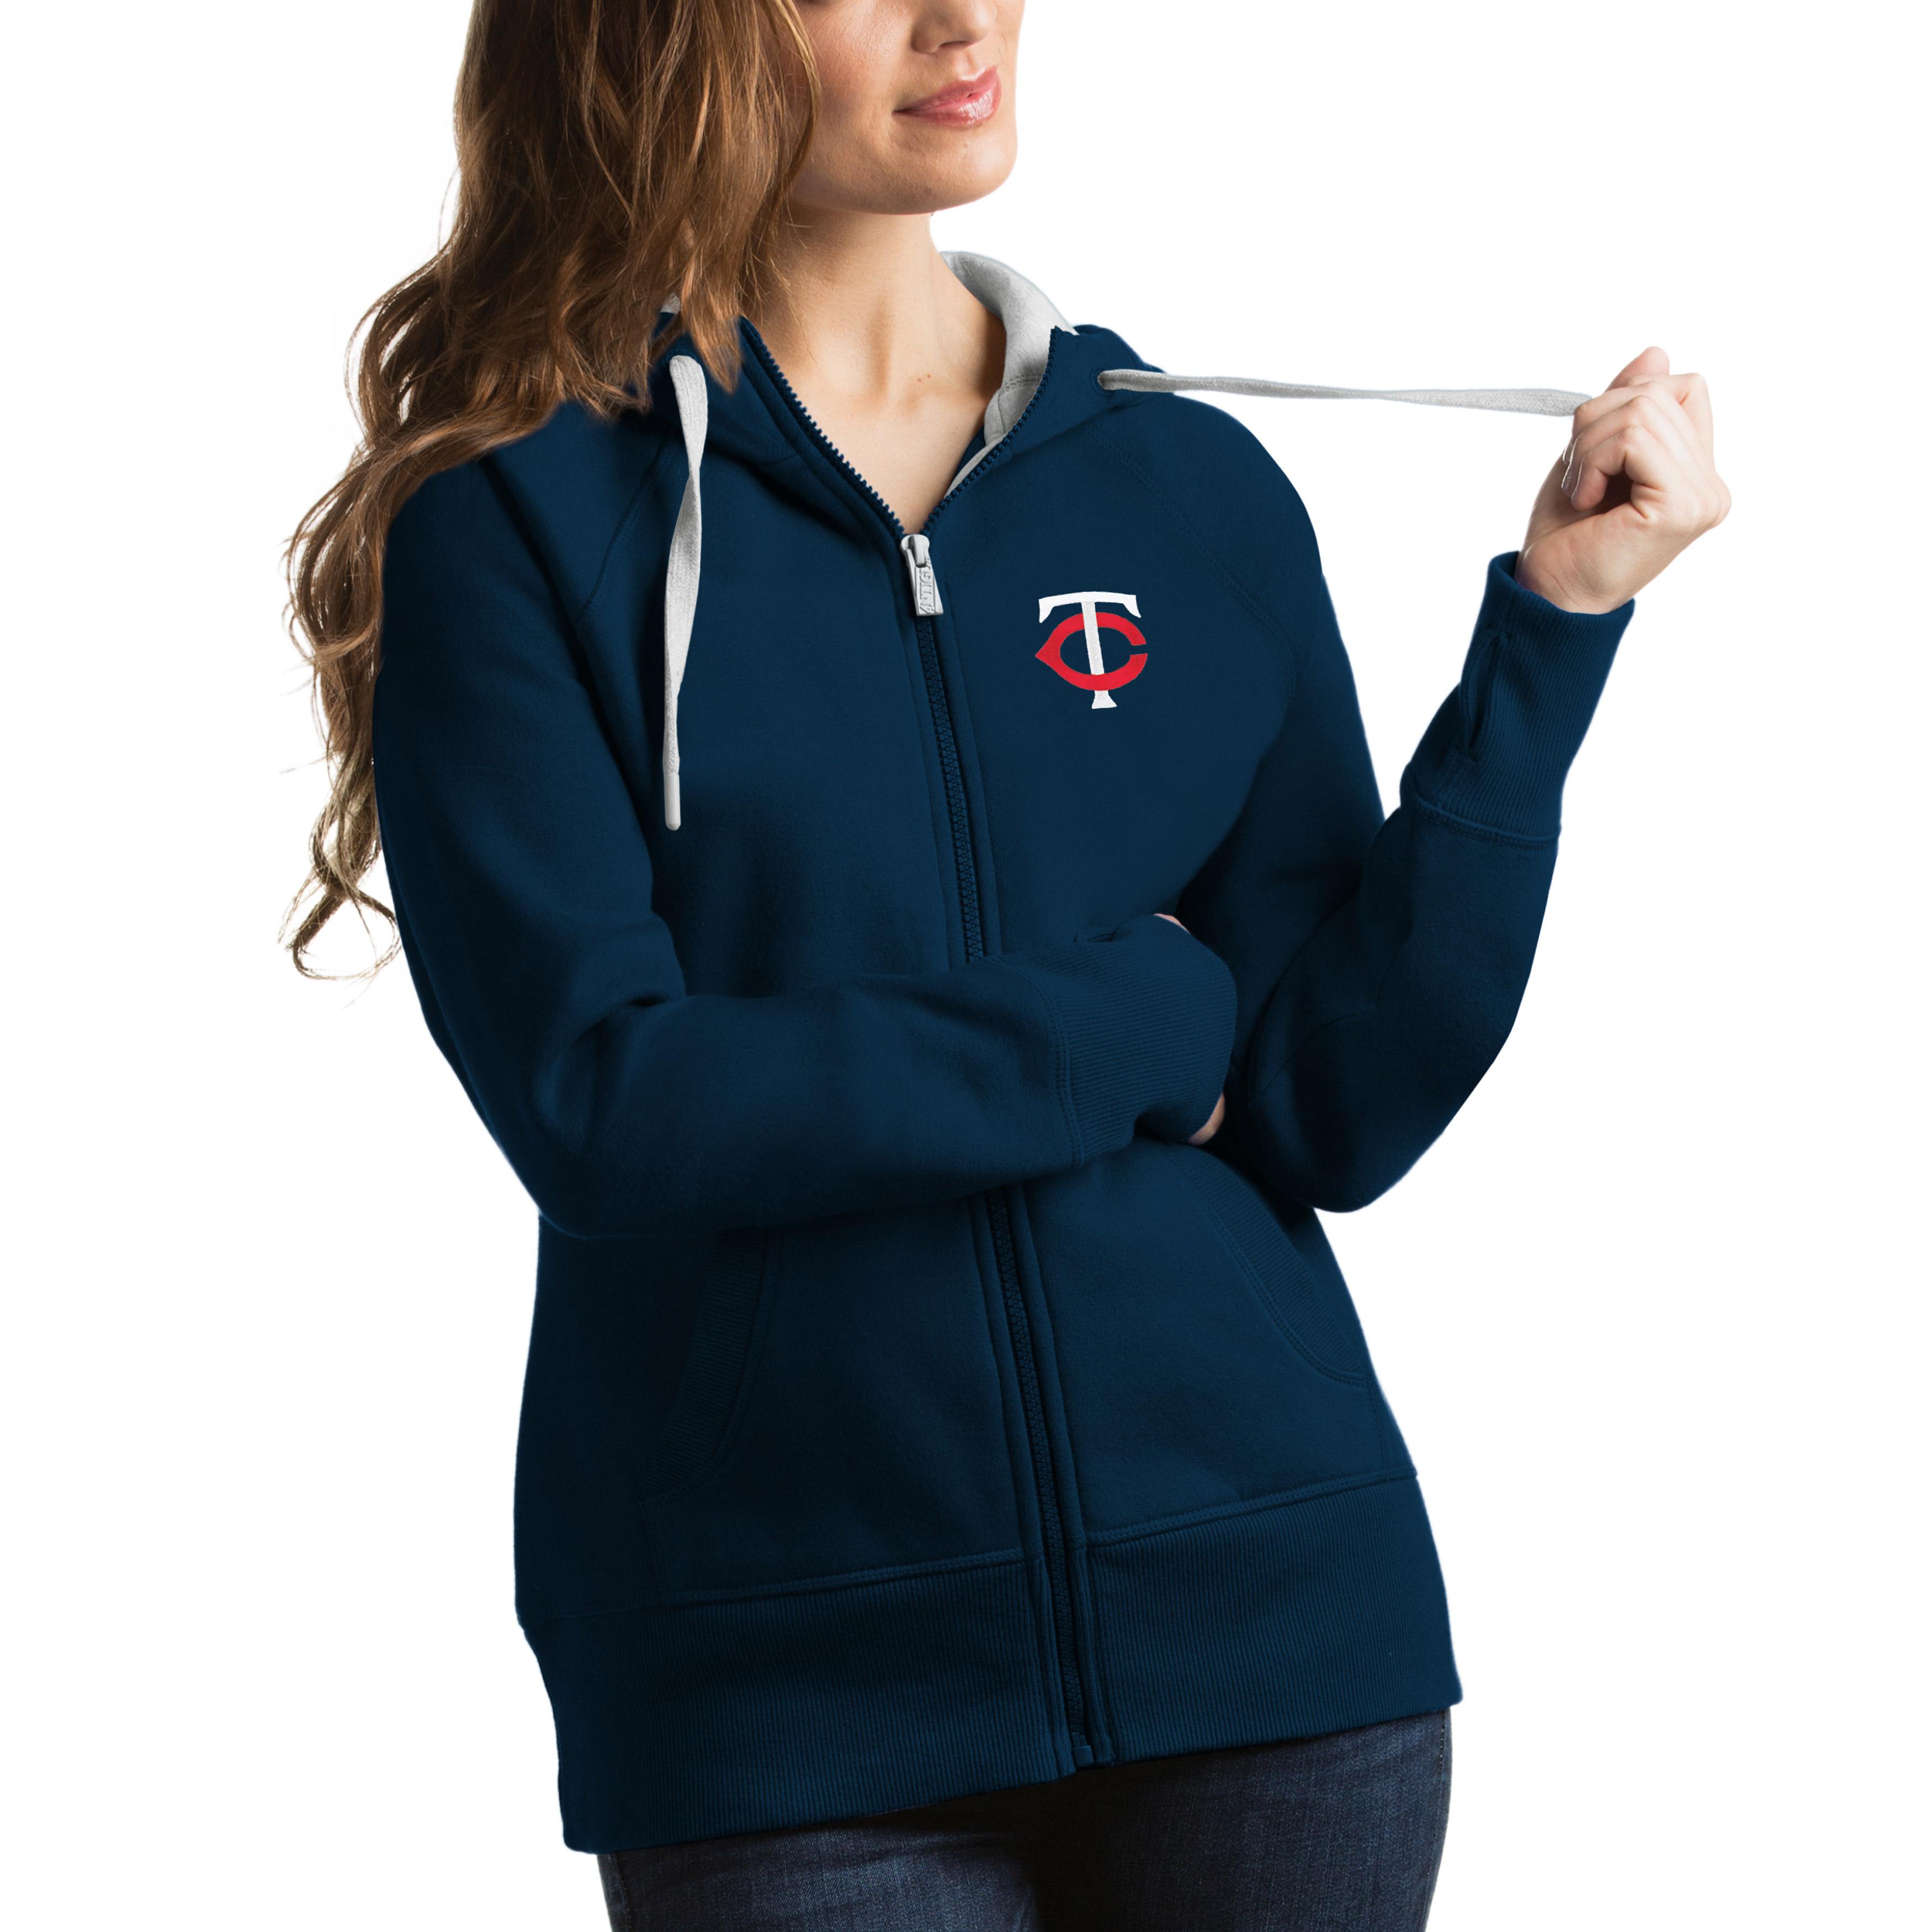 Minnesota Twins Antigua Women's Victory Full-Zip Hoodie - Navy